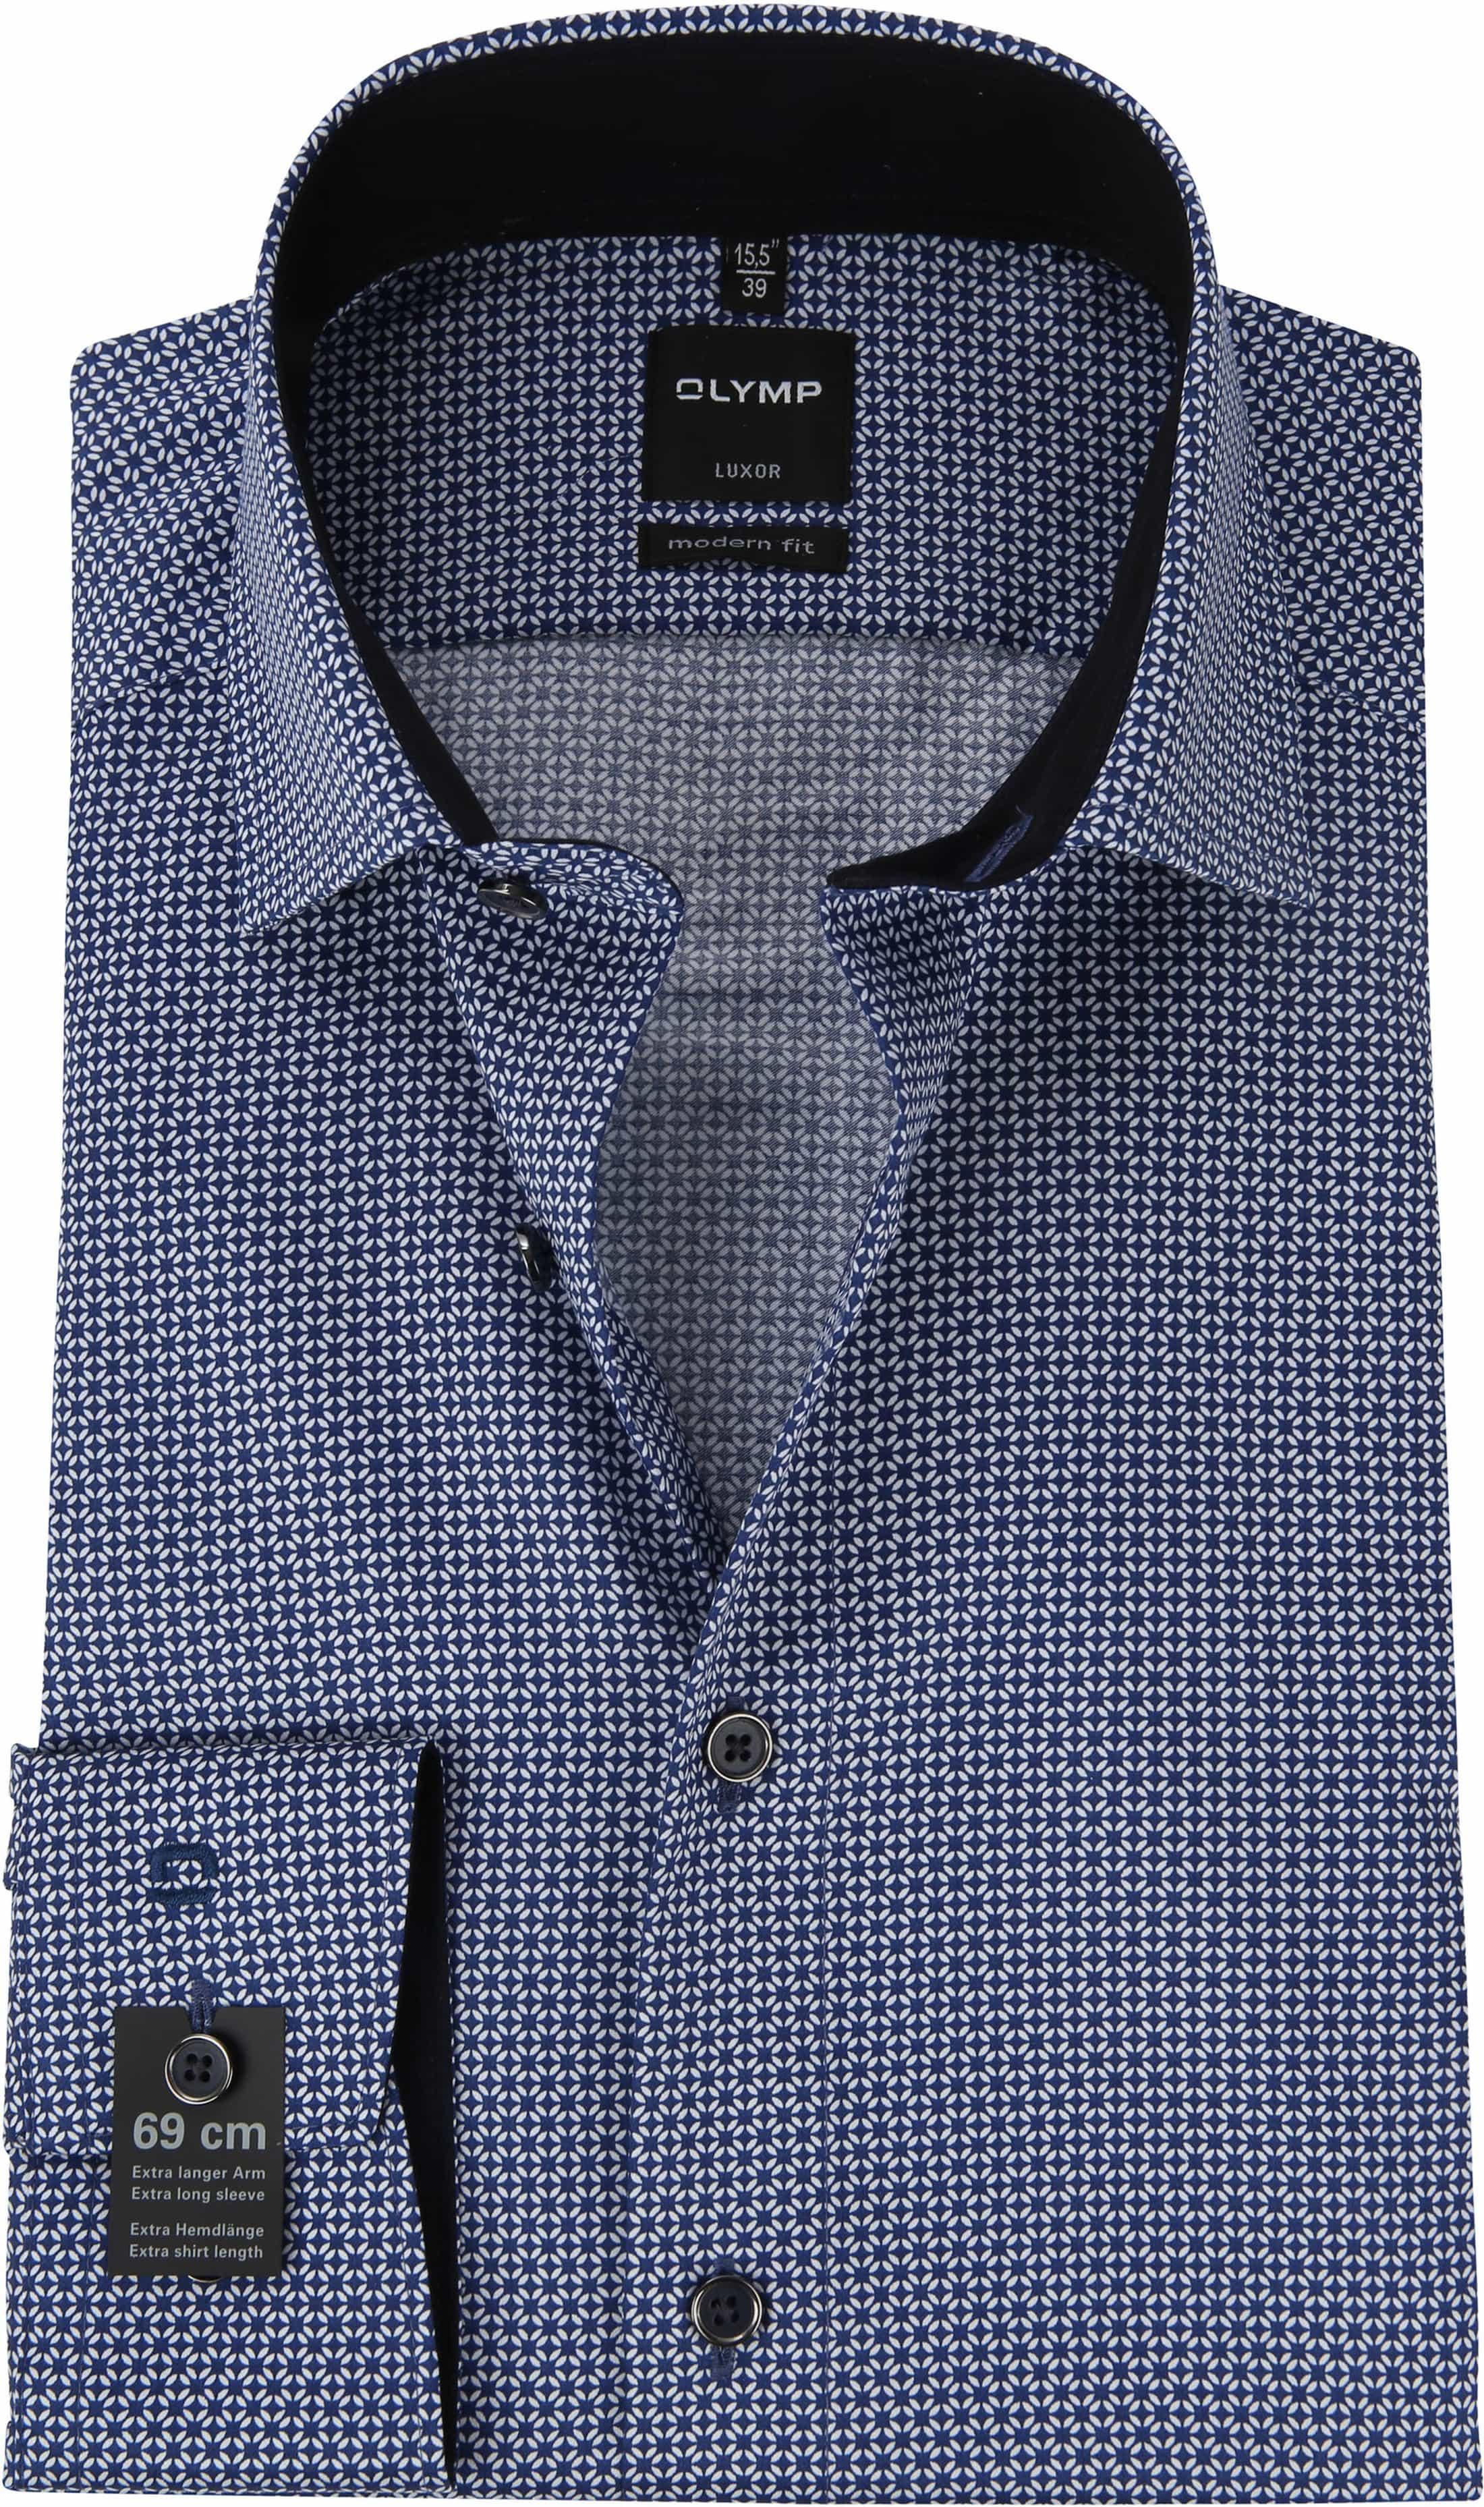 OLYMP Luxor MF Hemd Print Blau SL7 127049 online kaufen